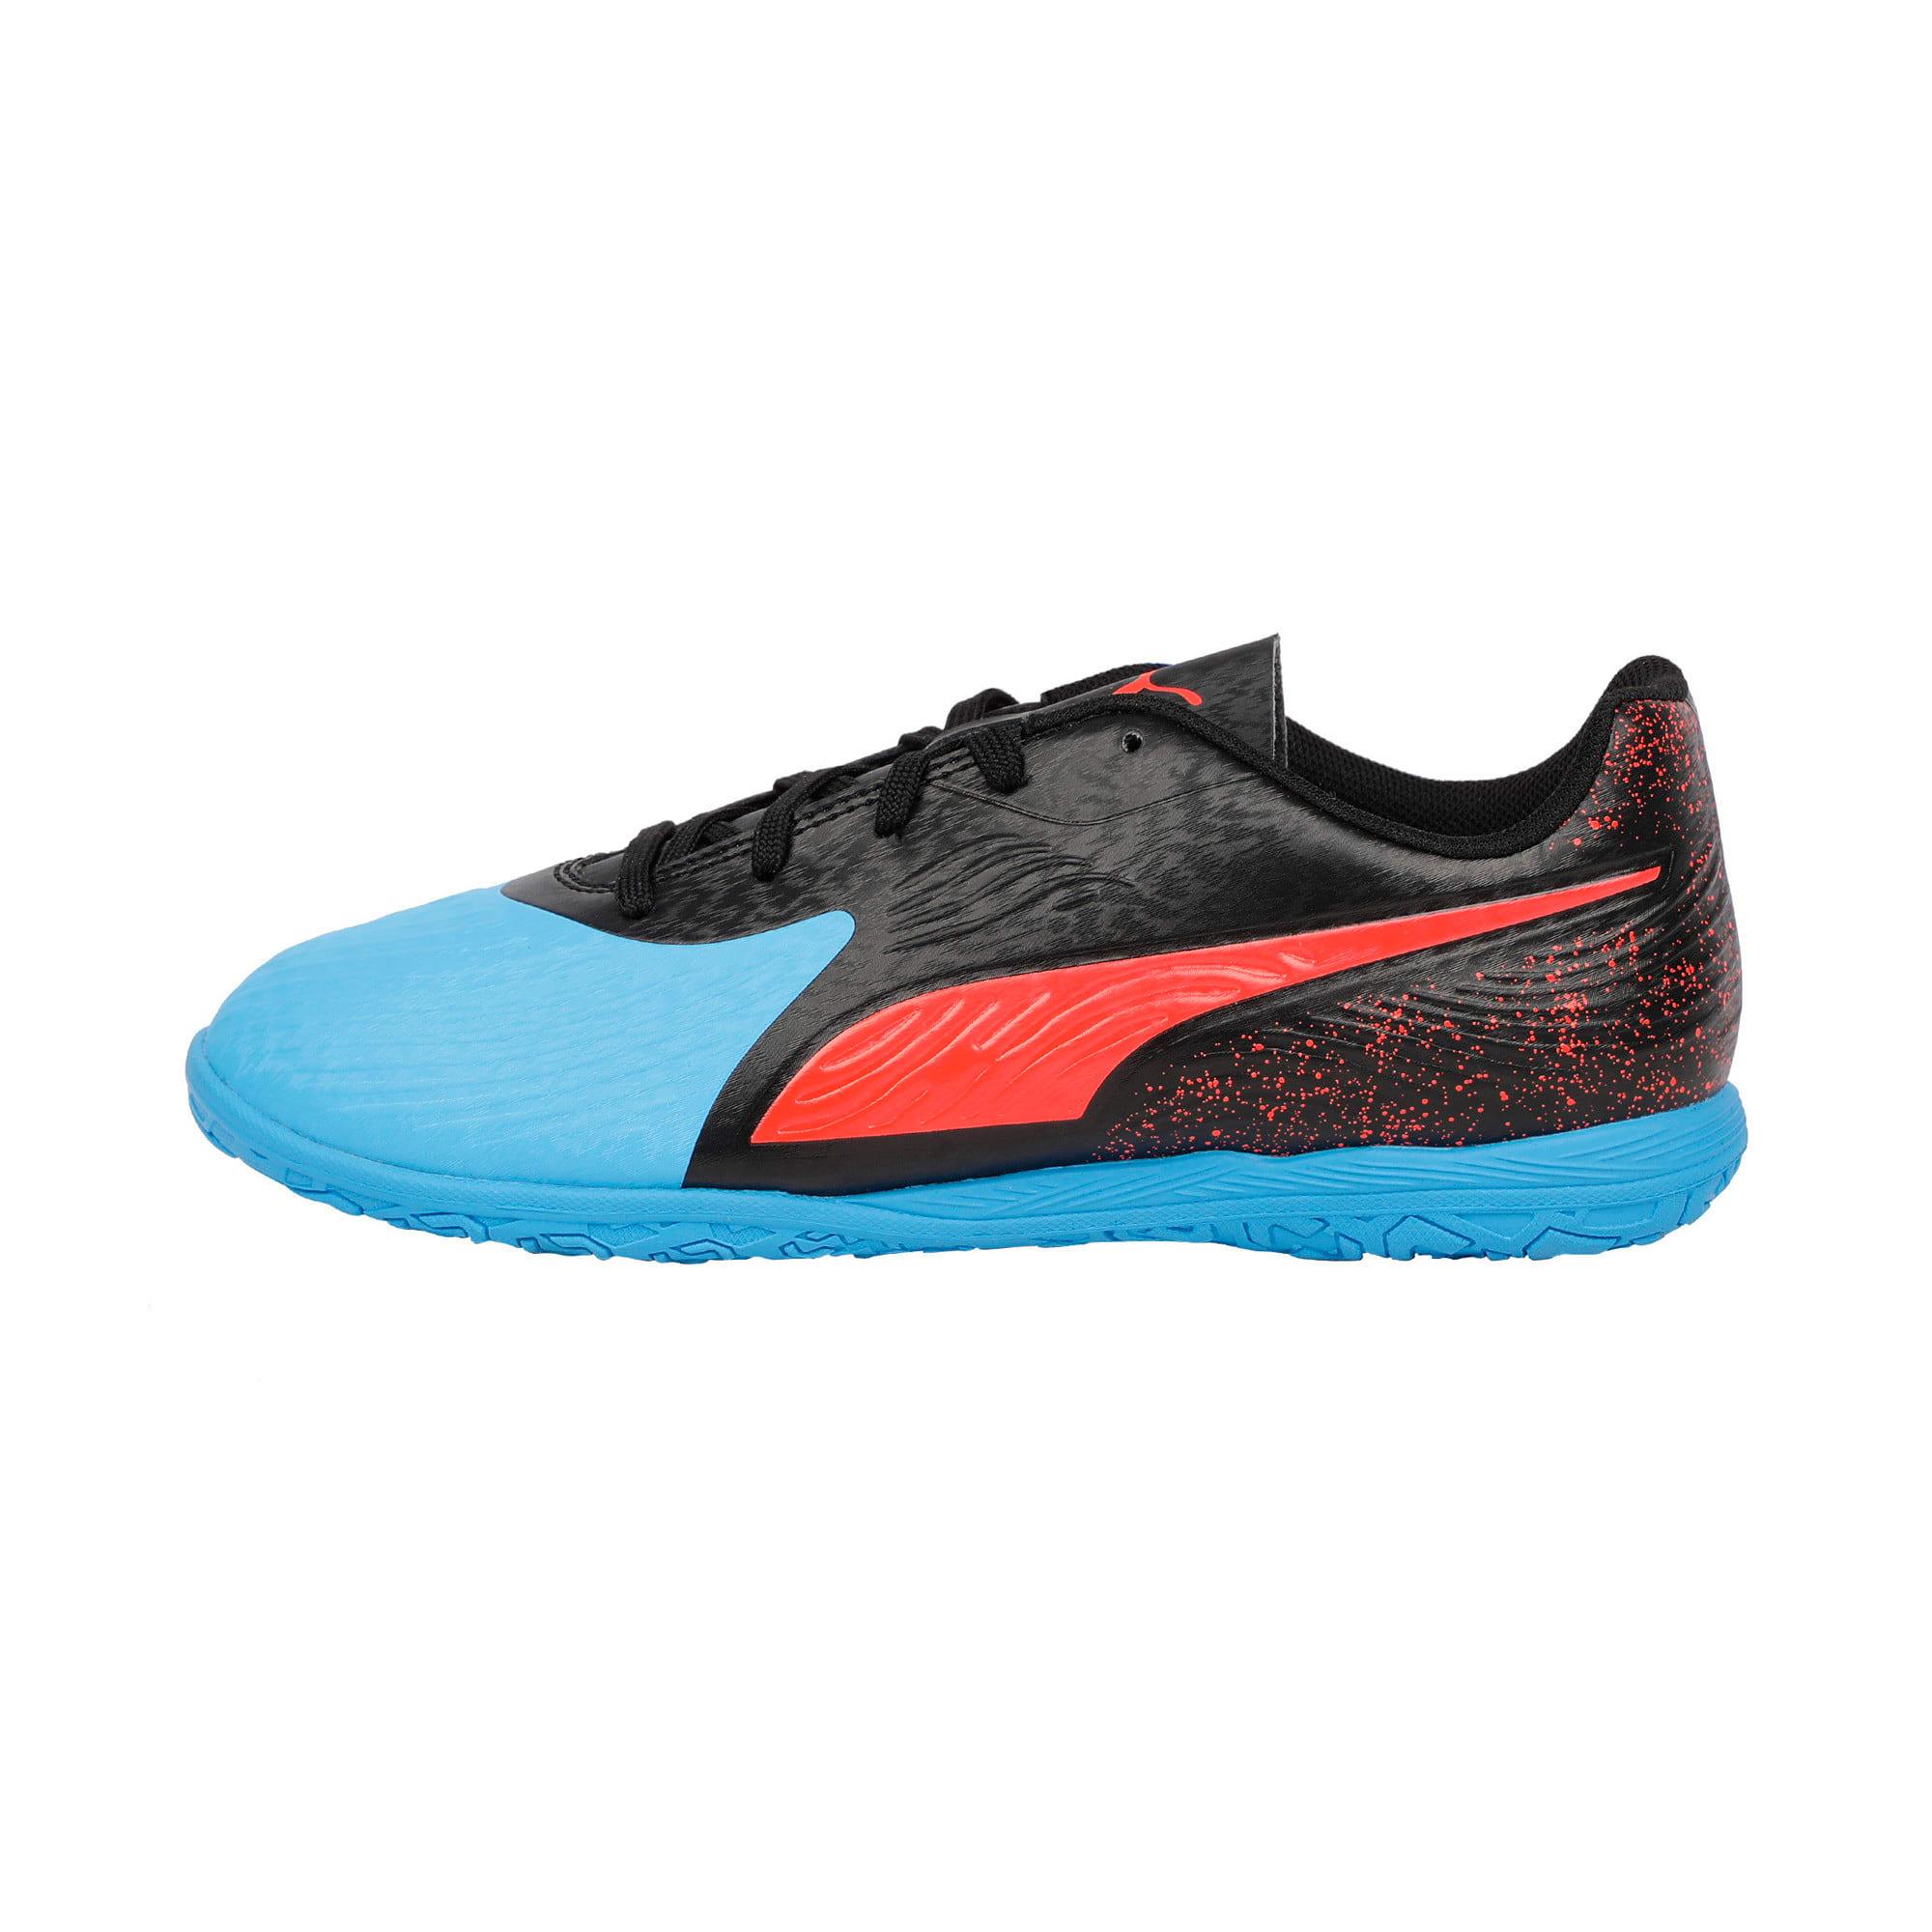 Thumbnail 1 of PUMA ONE 19.4 IT Youth Football Boots, Bleu Azur-Red Blast-Black, medium-IND